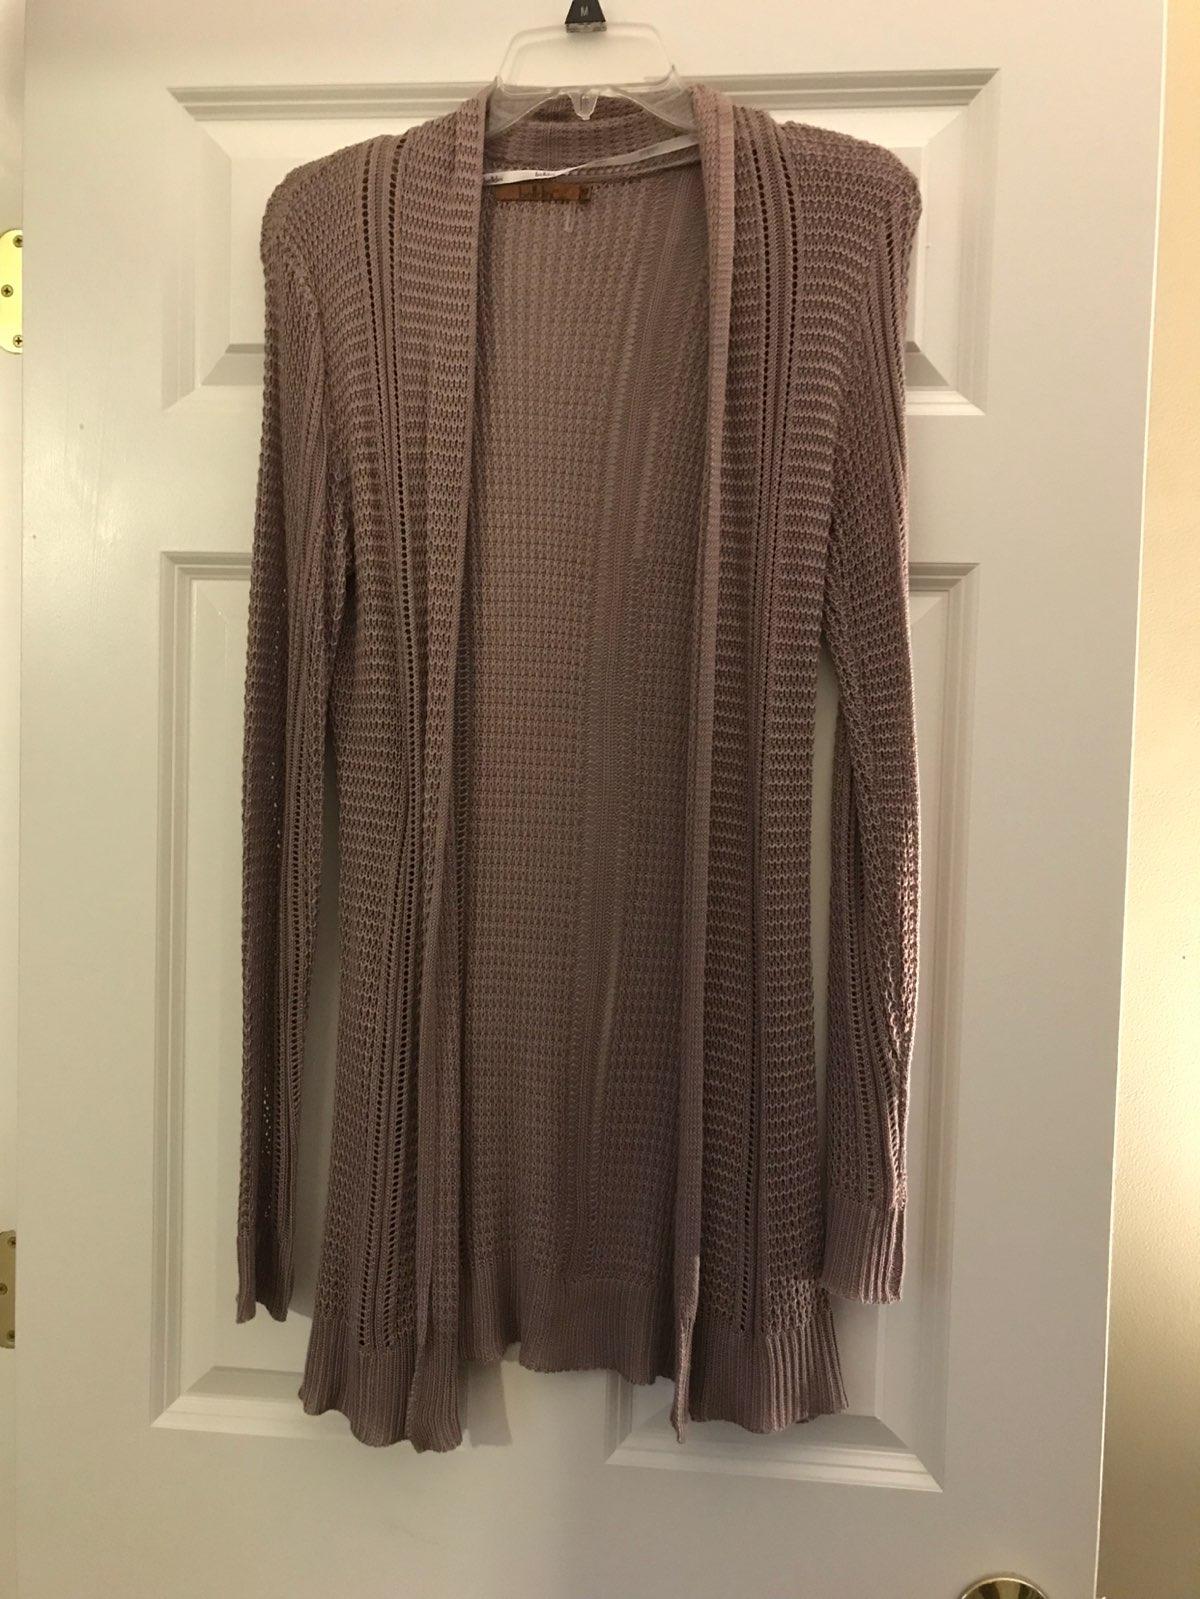 Long Silky Tan Cardigan Sweater - Mercari: BUY & SELL THINGS YOU LOVE